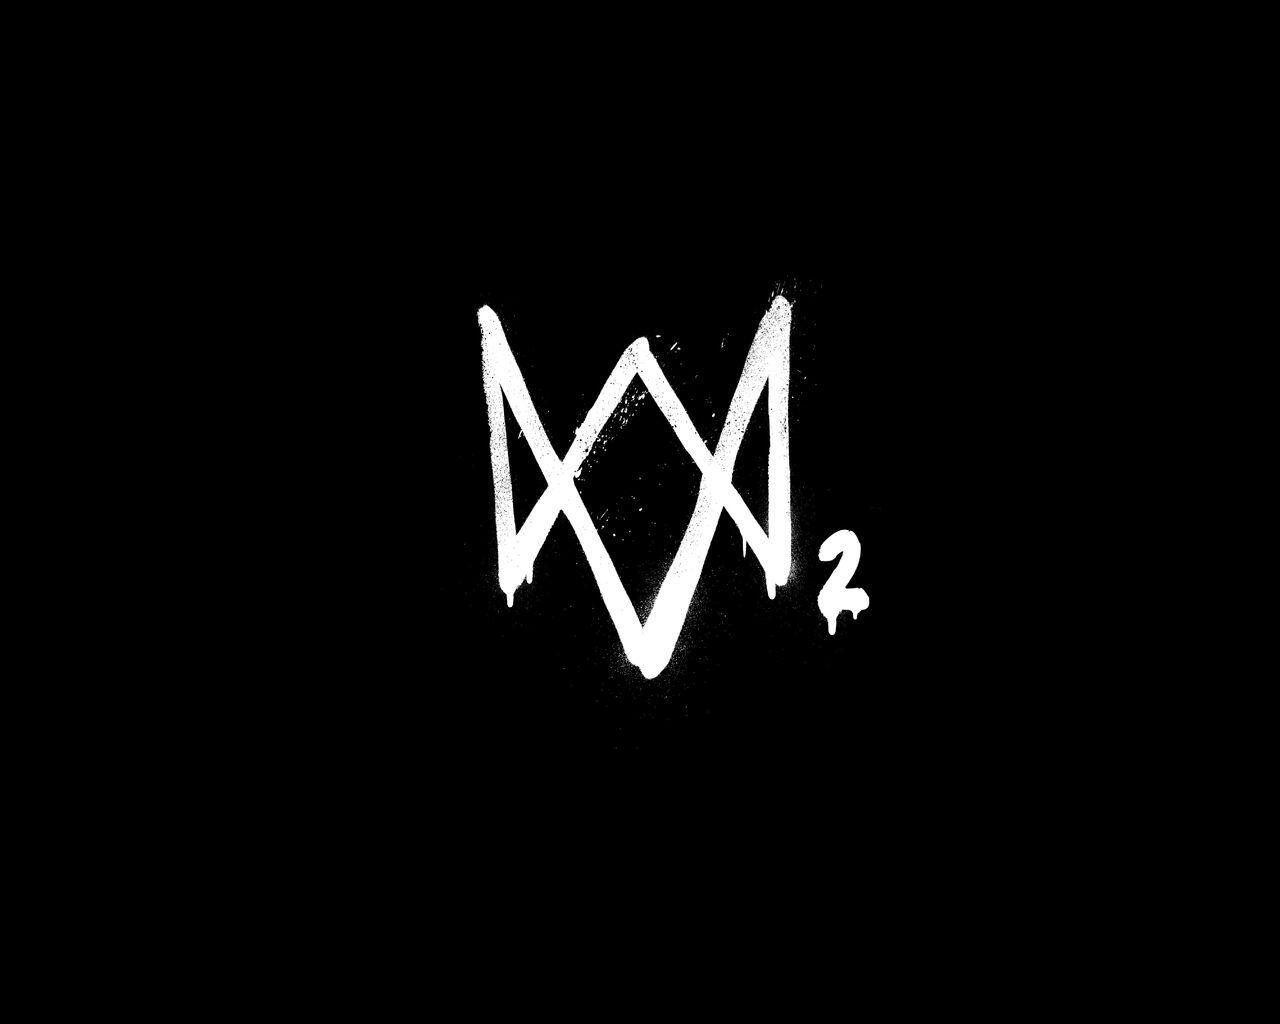 watch-dogs-2-8k-logo-i2.jpg